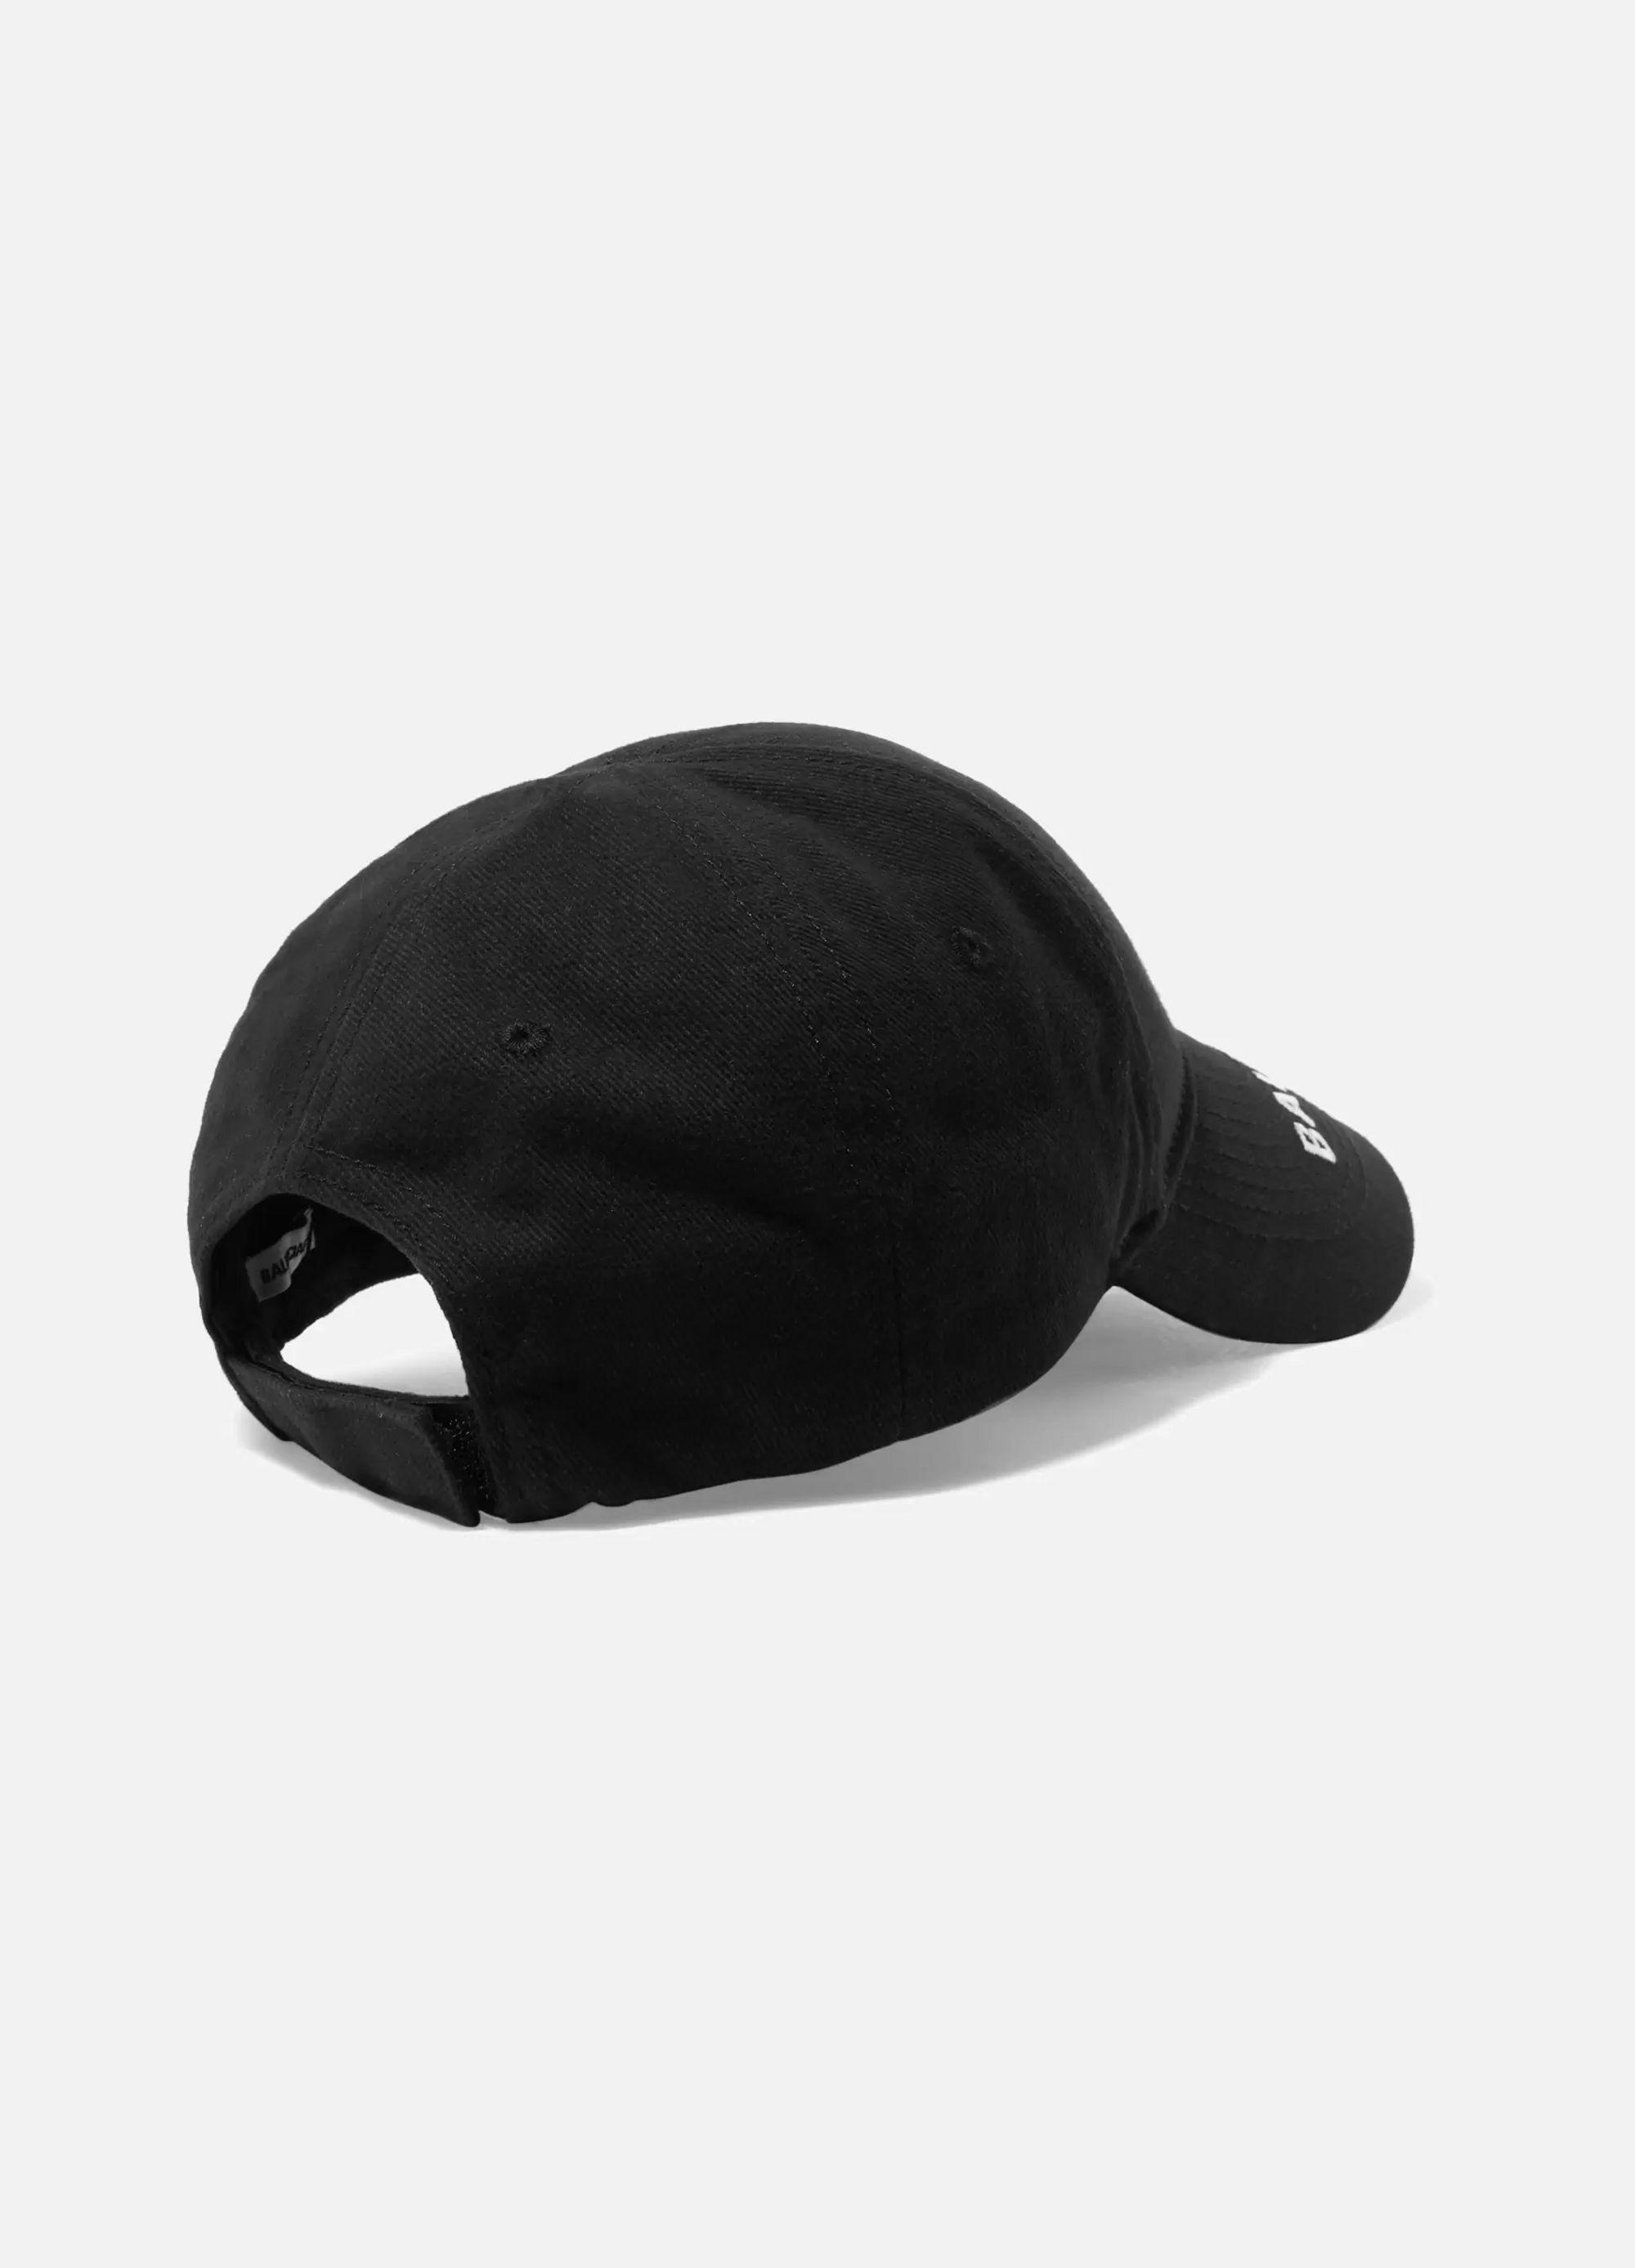 Balenciaga + World Food Programme embroidered cotton-twill baseball cap